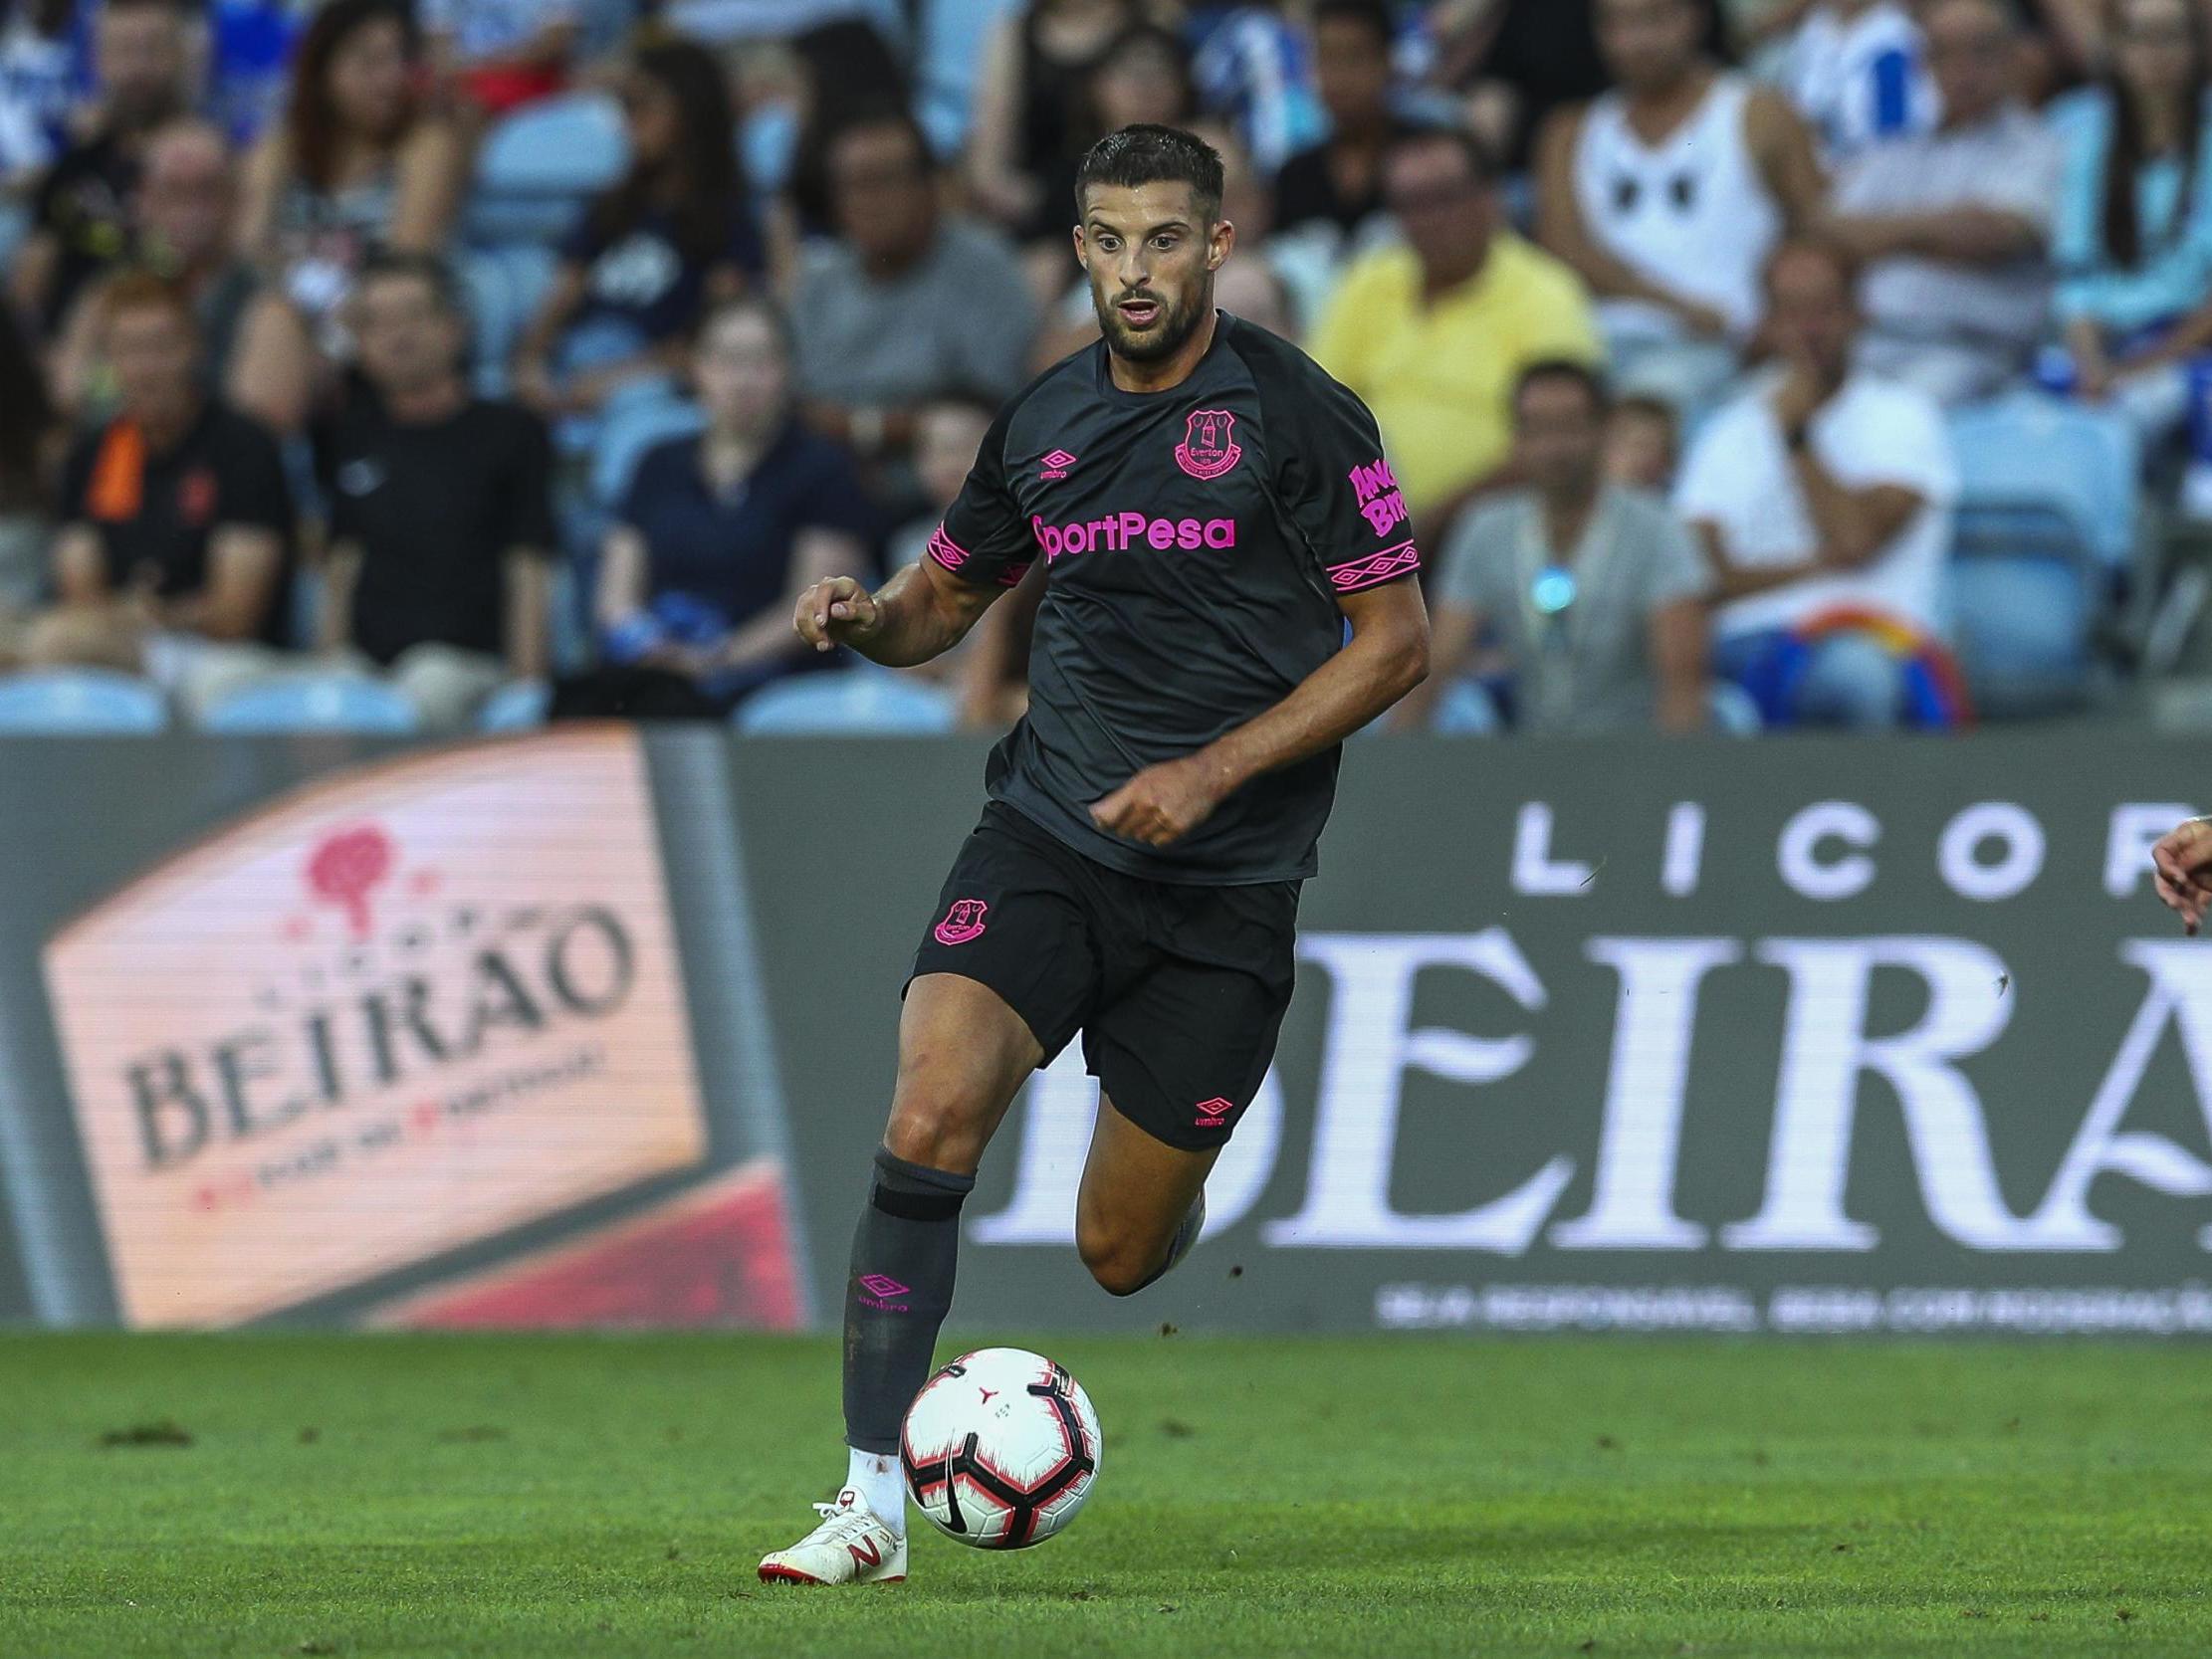 Everton transfer news: Kevin Mirallas agrees season-long loan move to Fiorentina